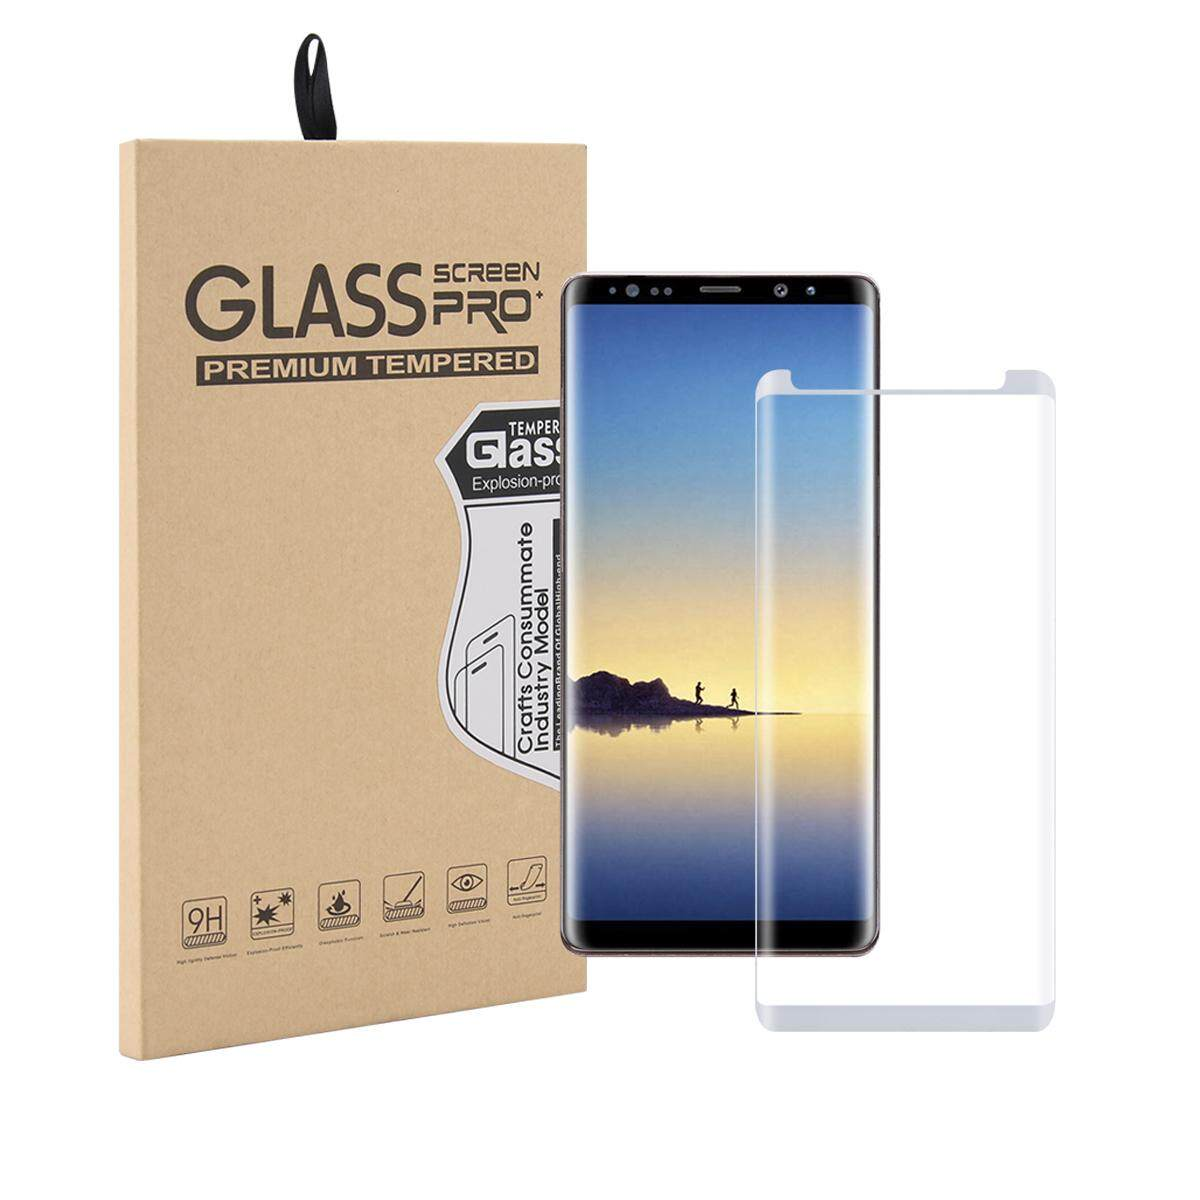 [Original] Phone Case for 1 Pack Tempered Glass Screen Protector Film Anti-Scratch Screen Cover for Microsoft Lumia 650